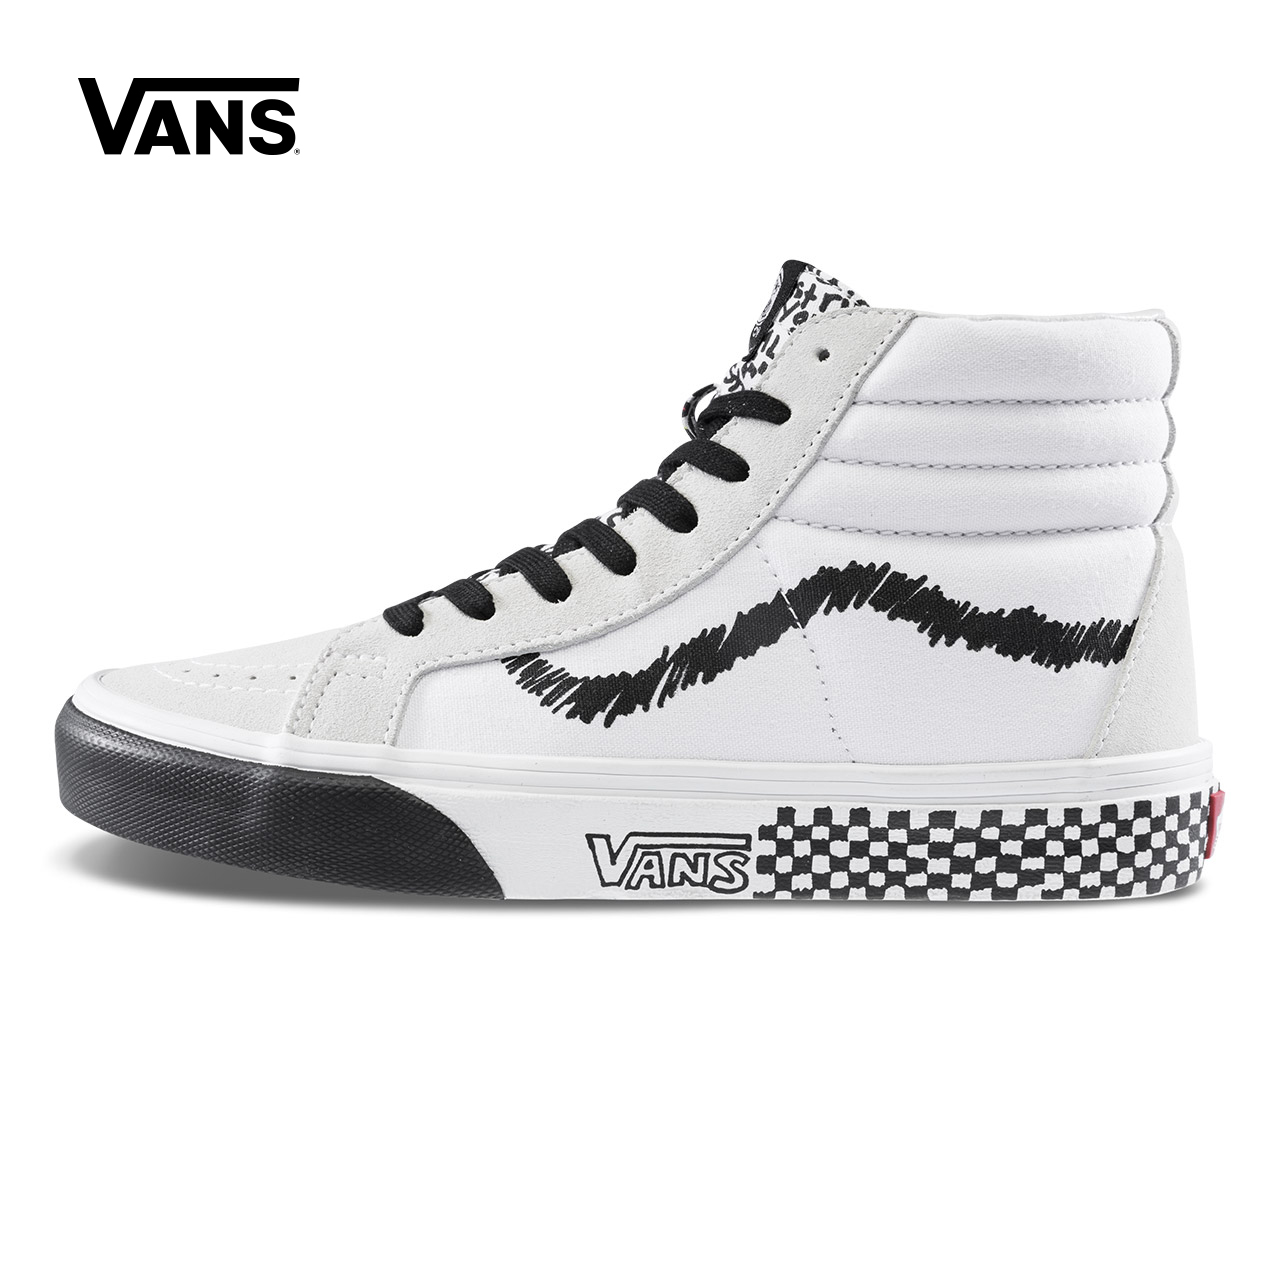 Original New Arrival Vans Men's & Women's Classic SK8-HI Reissue Skateboarding Shoes Sneakers Canvas Comfortable VN0A2XSBU7B кеды vans sk8 hi mte